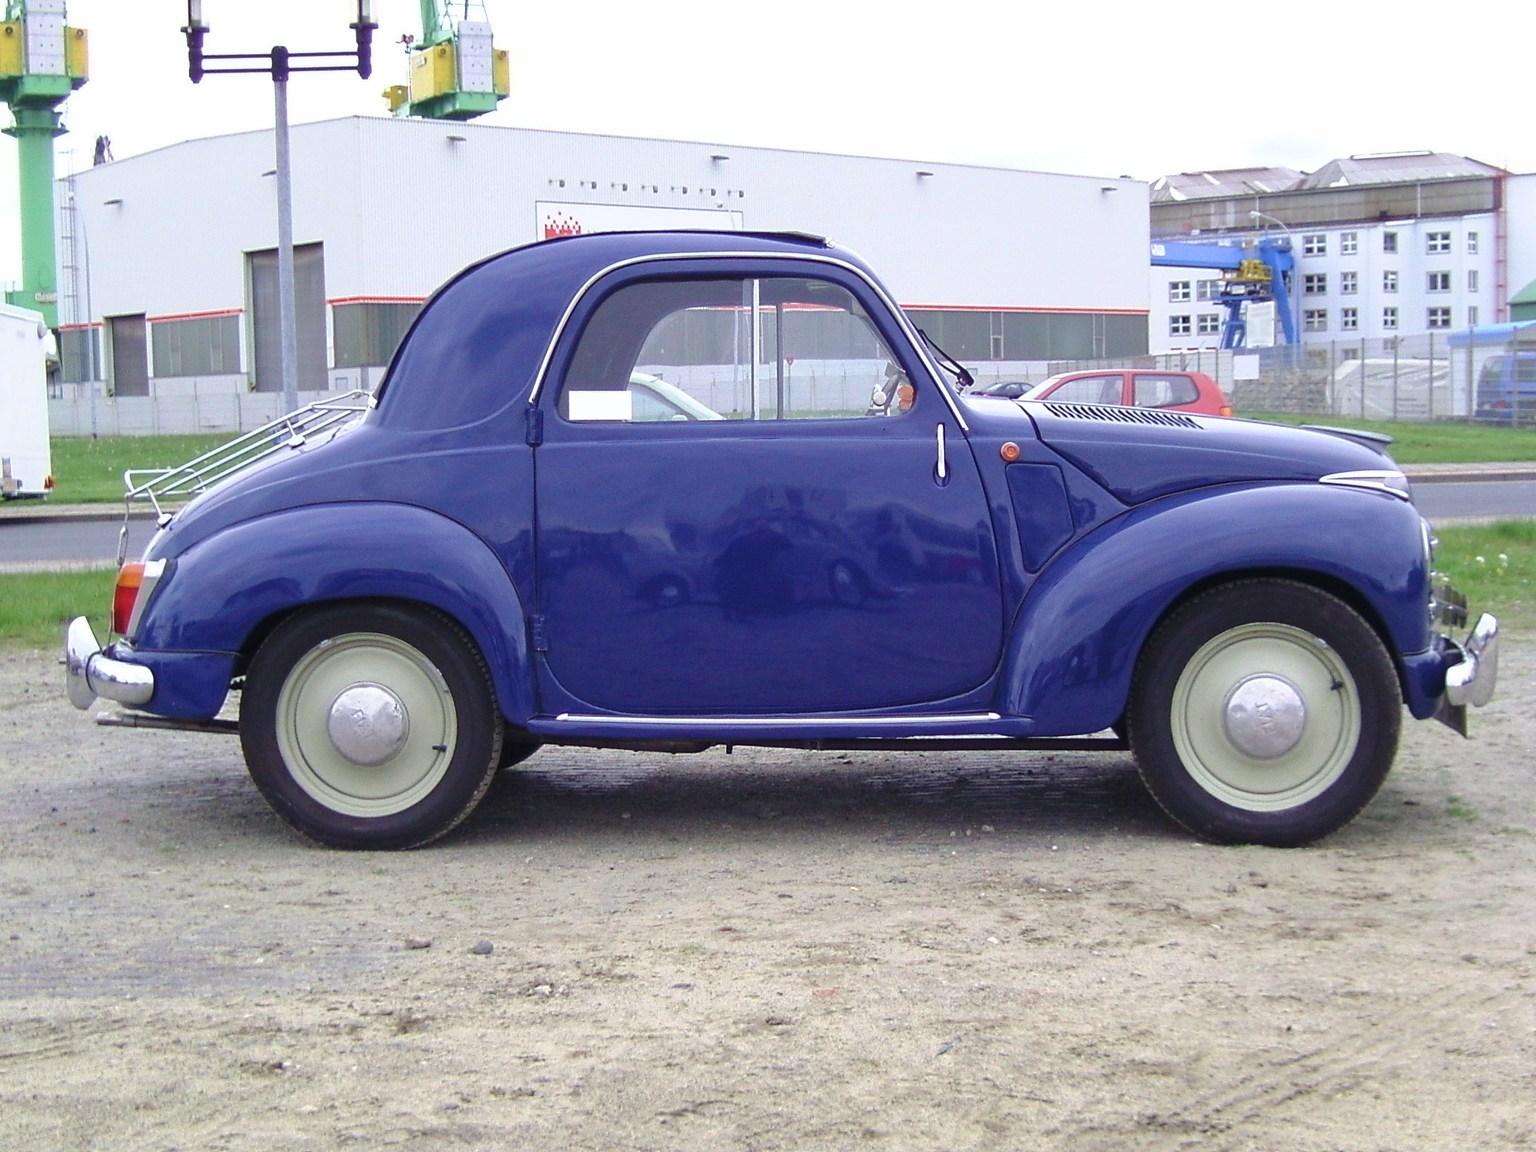 File:Fiat Topolino blue 2.jpg - Wikimedia Commons